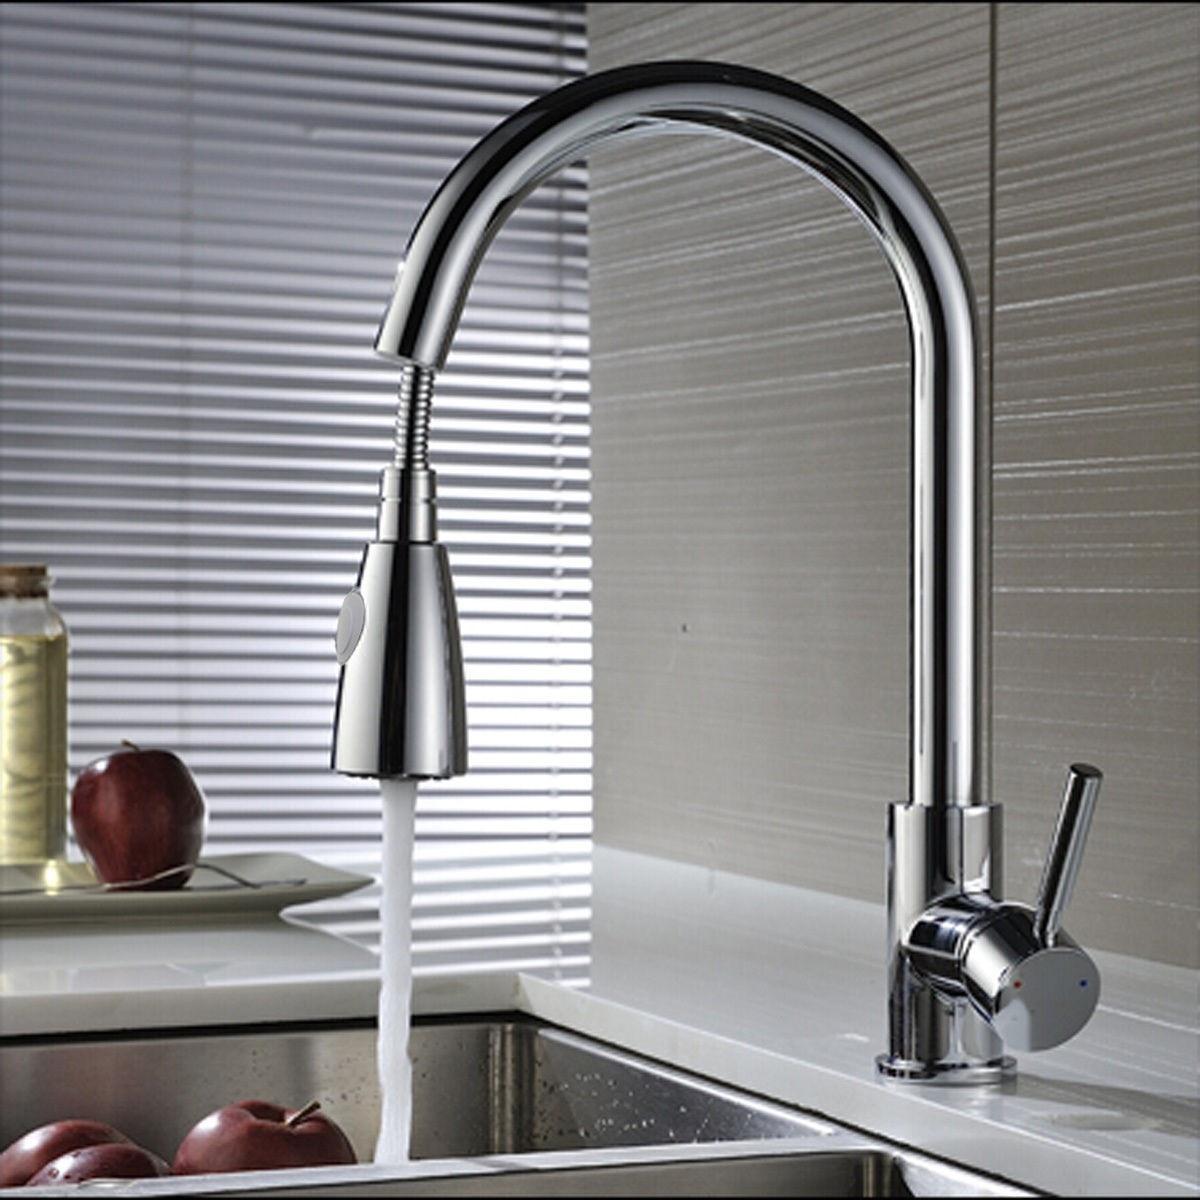 Modren Pull Out Kitchen Spray Mixer Tap Basin Sink Faucet 360Rotation Copper Chrome Mixing Faucet With 2 Inlet Cold And HotModren Pull Out Kitchen Spray Mixer Tap Basin Sink Faucet 360Rotation Copper Chrome Mixing Faucet With 2 Inlet Cold And Hot